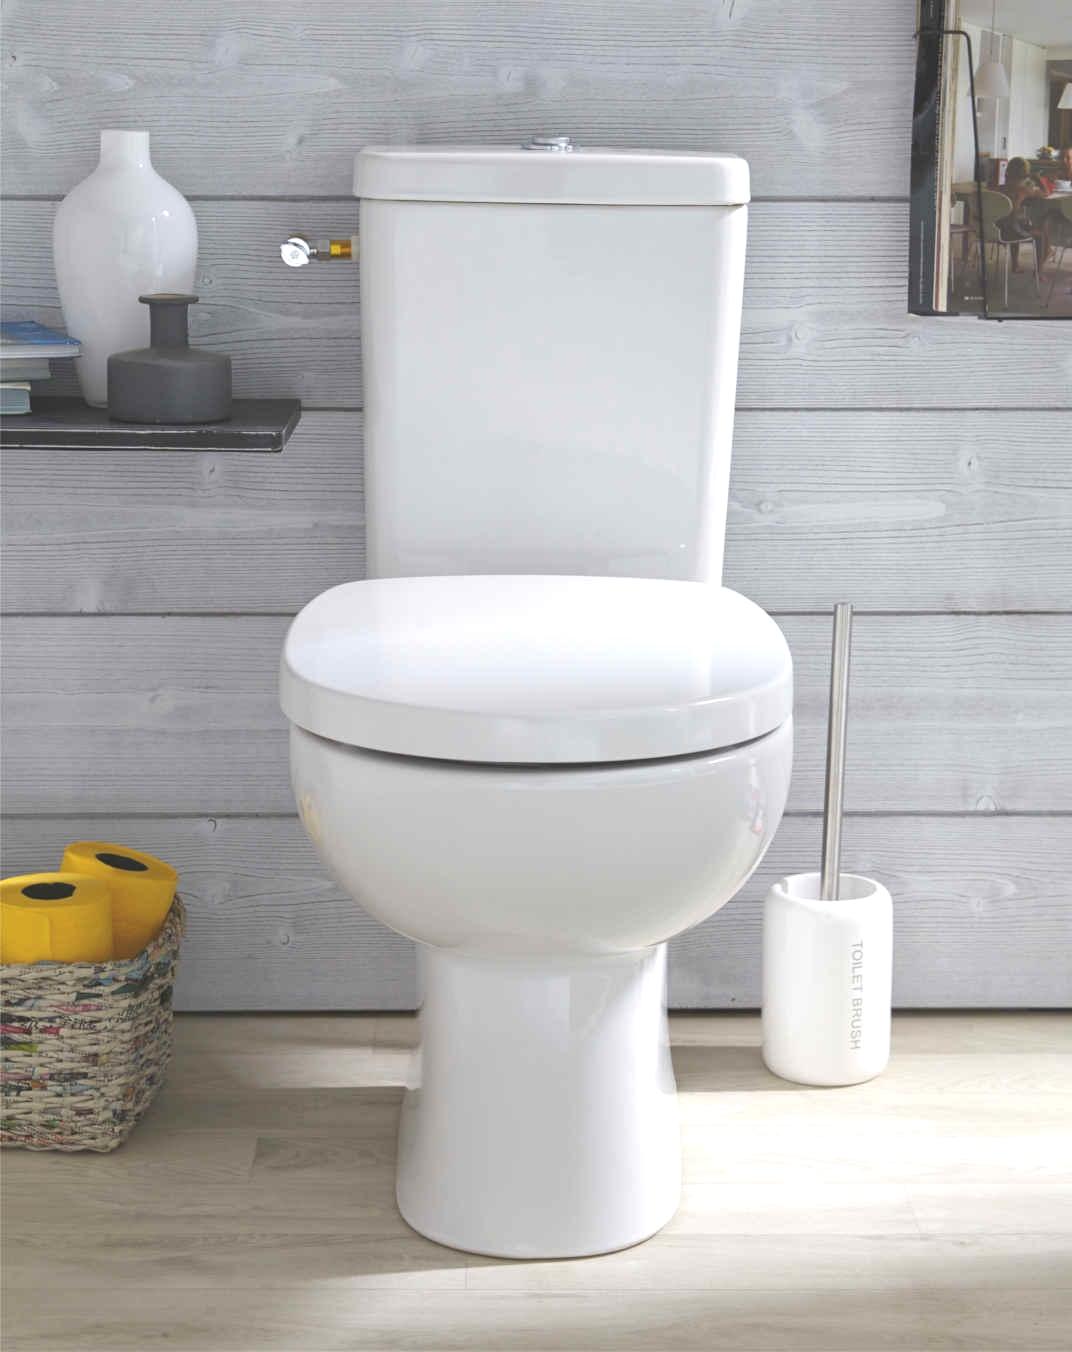 classement guide d achat top wc chimiques en oct 2018. Black Bedroom Furniture Sets. Home Design Ideas